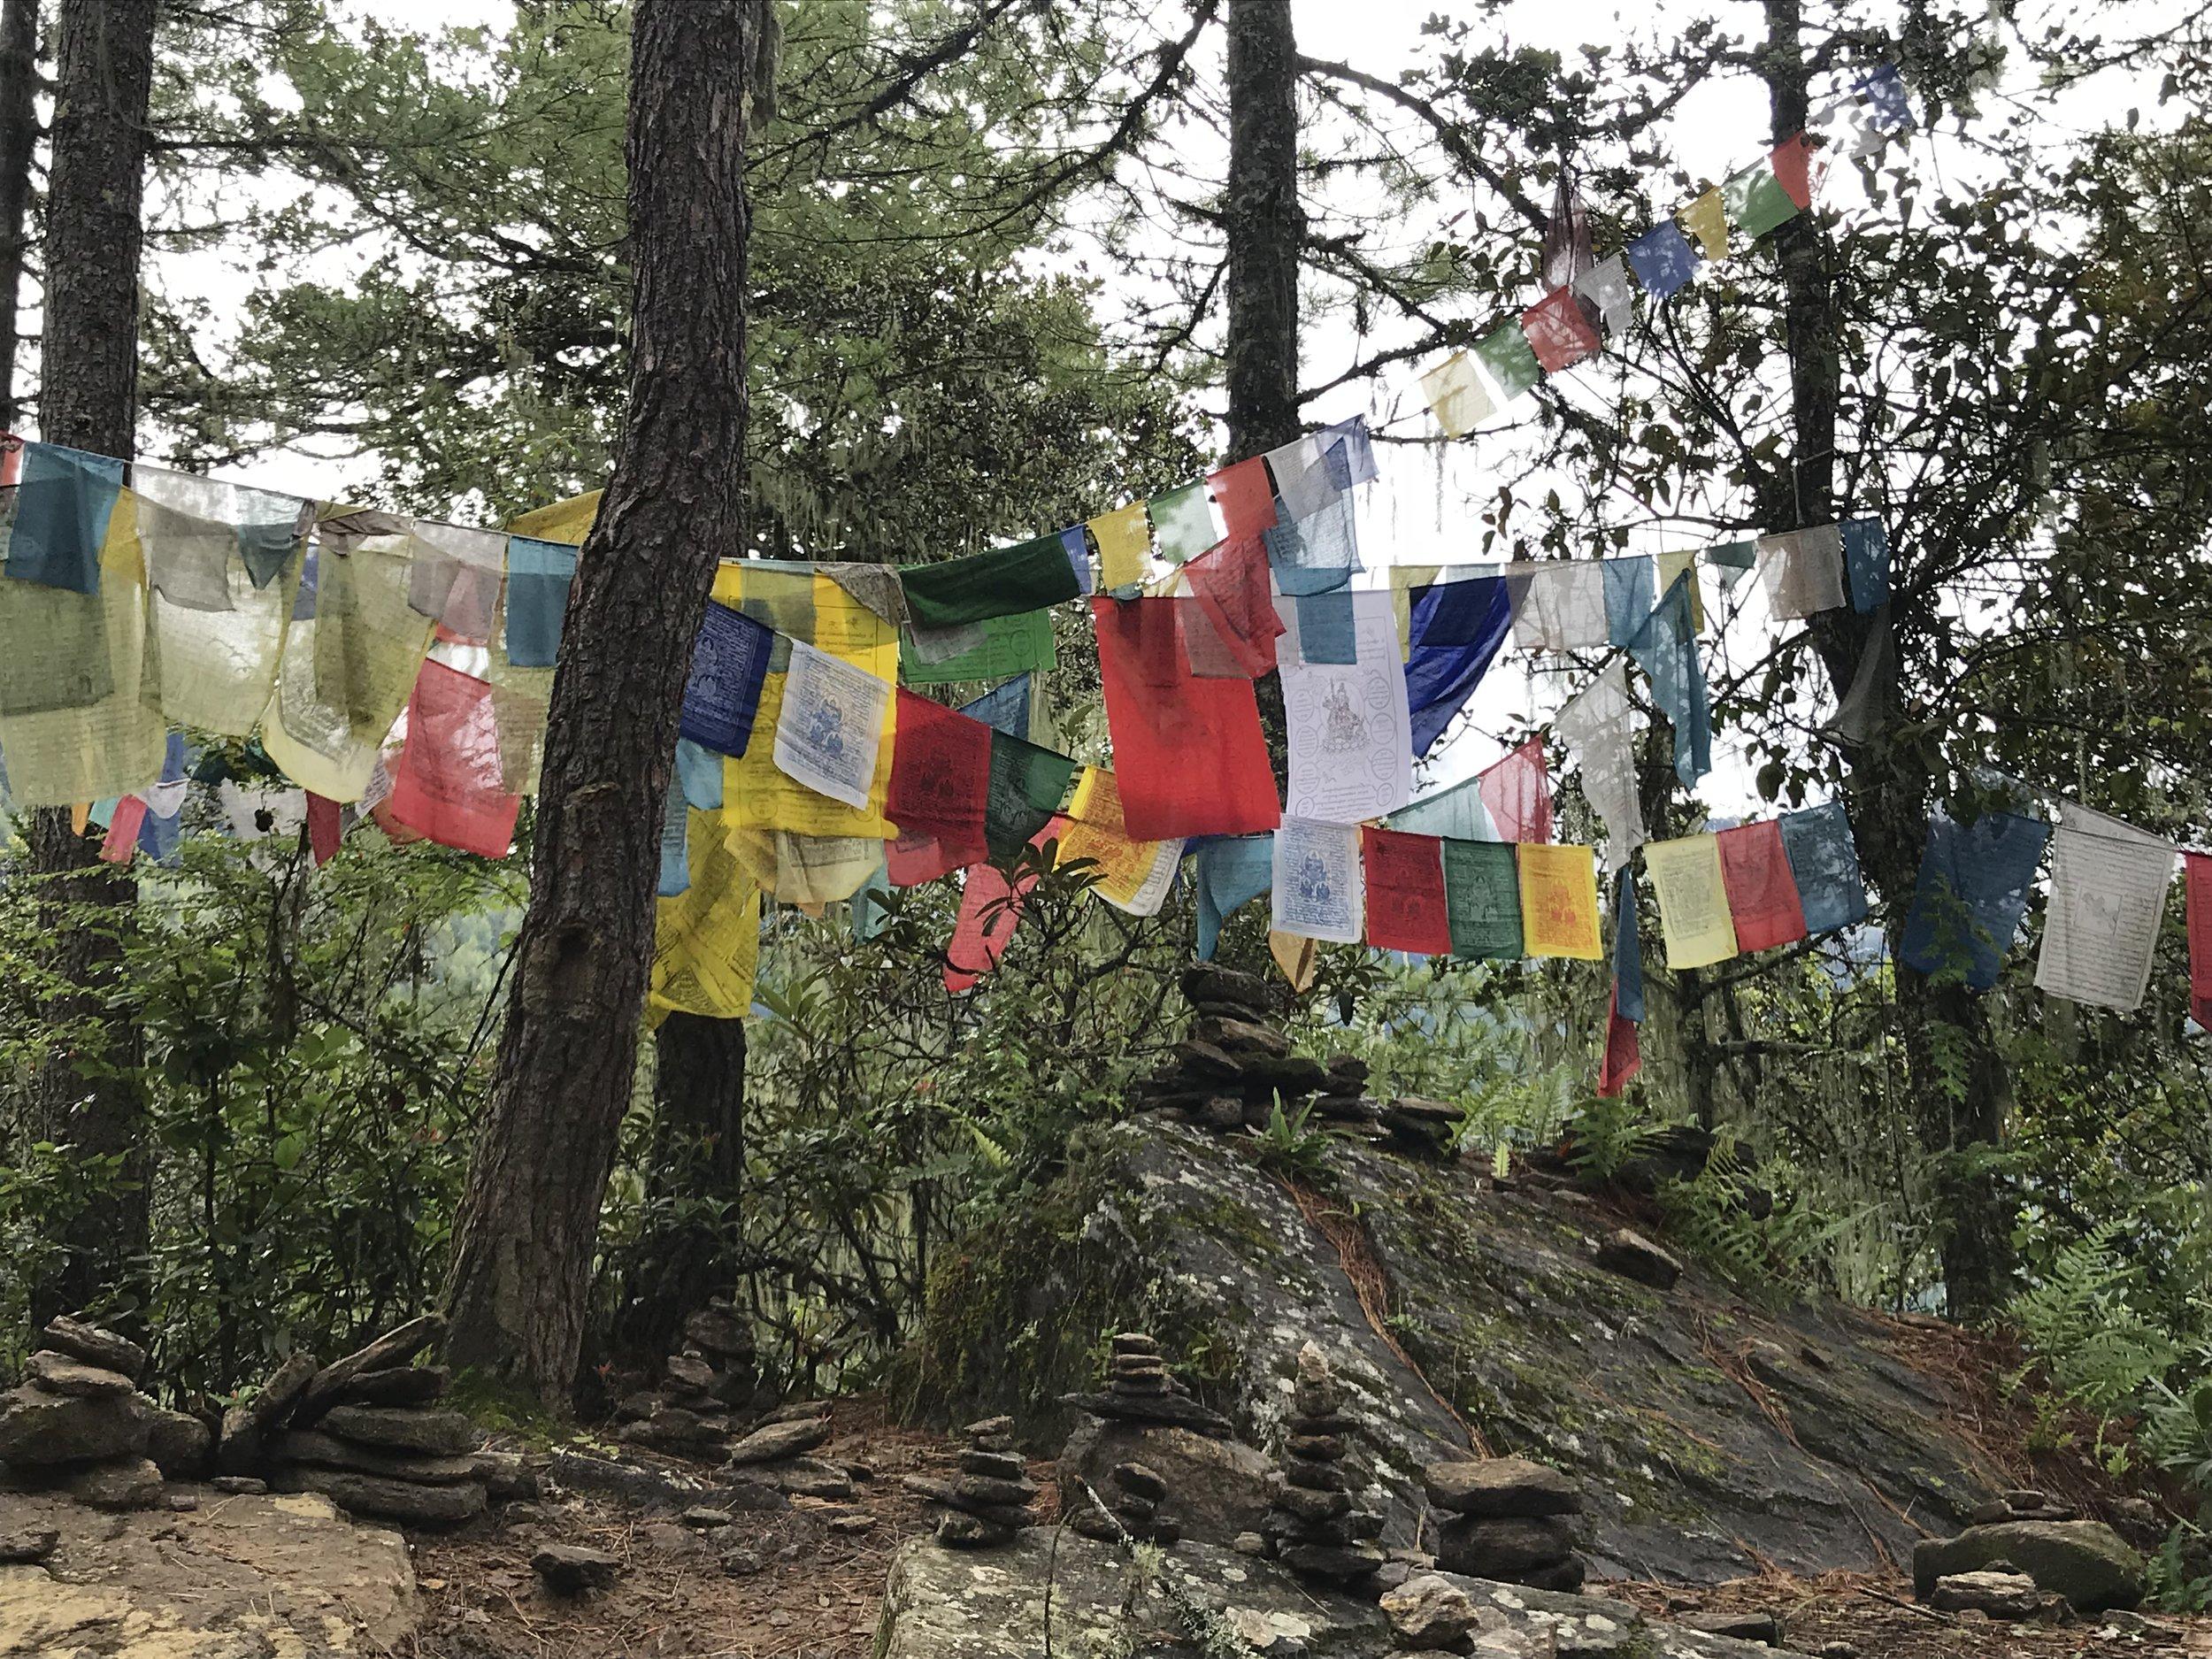 Image author's own, Paro, Bhutan.